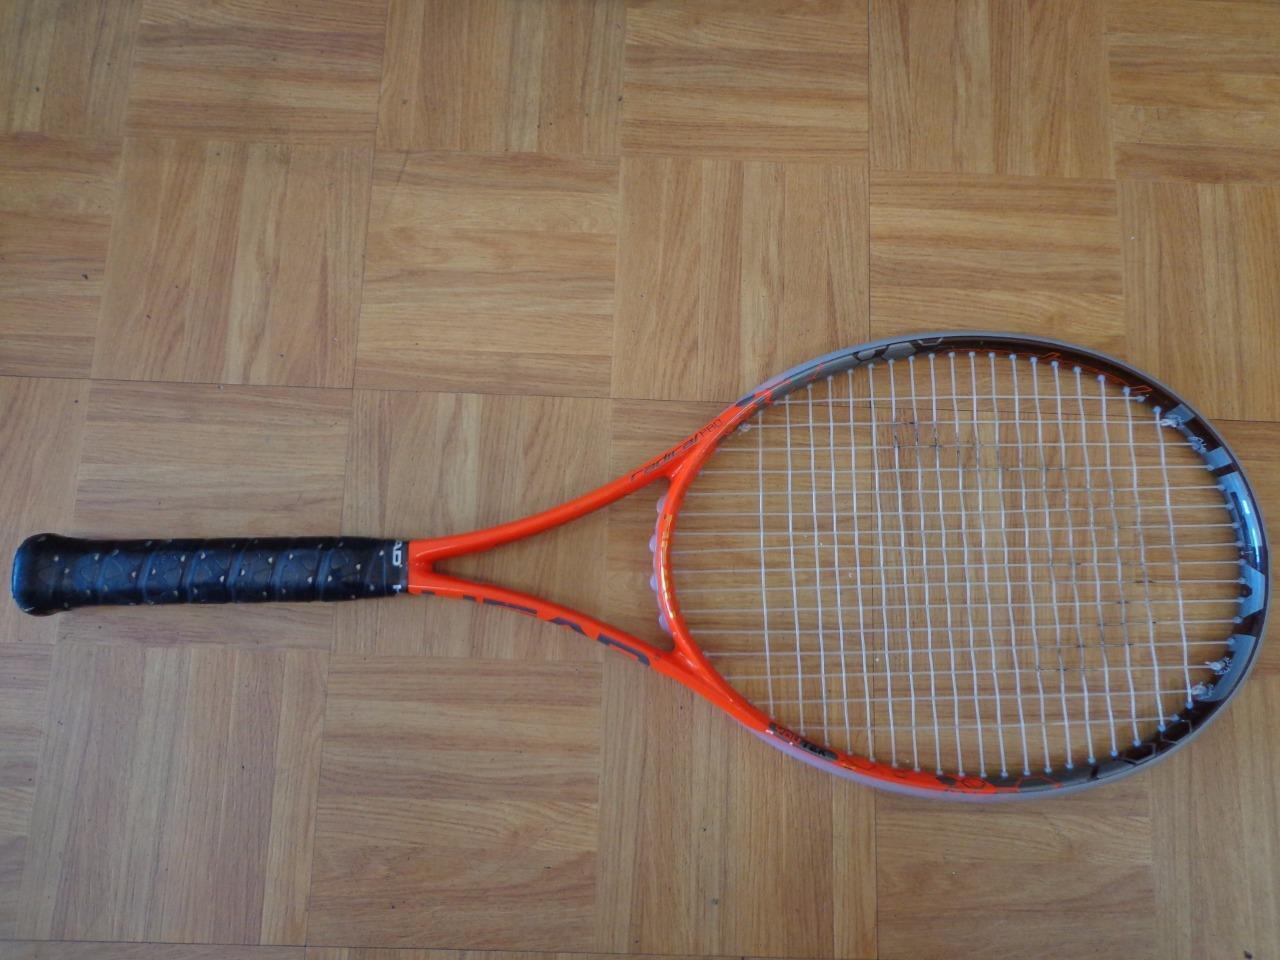 Head Youtek IG radical pro 98 head 10.9oz 4 1 2 grip Tennis Racquet